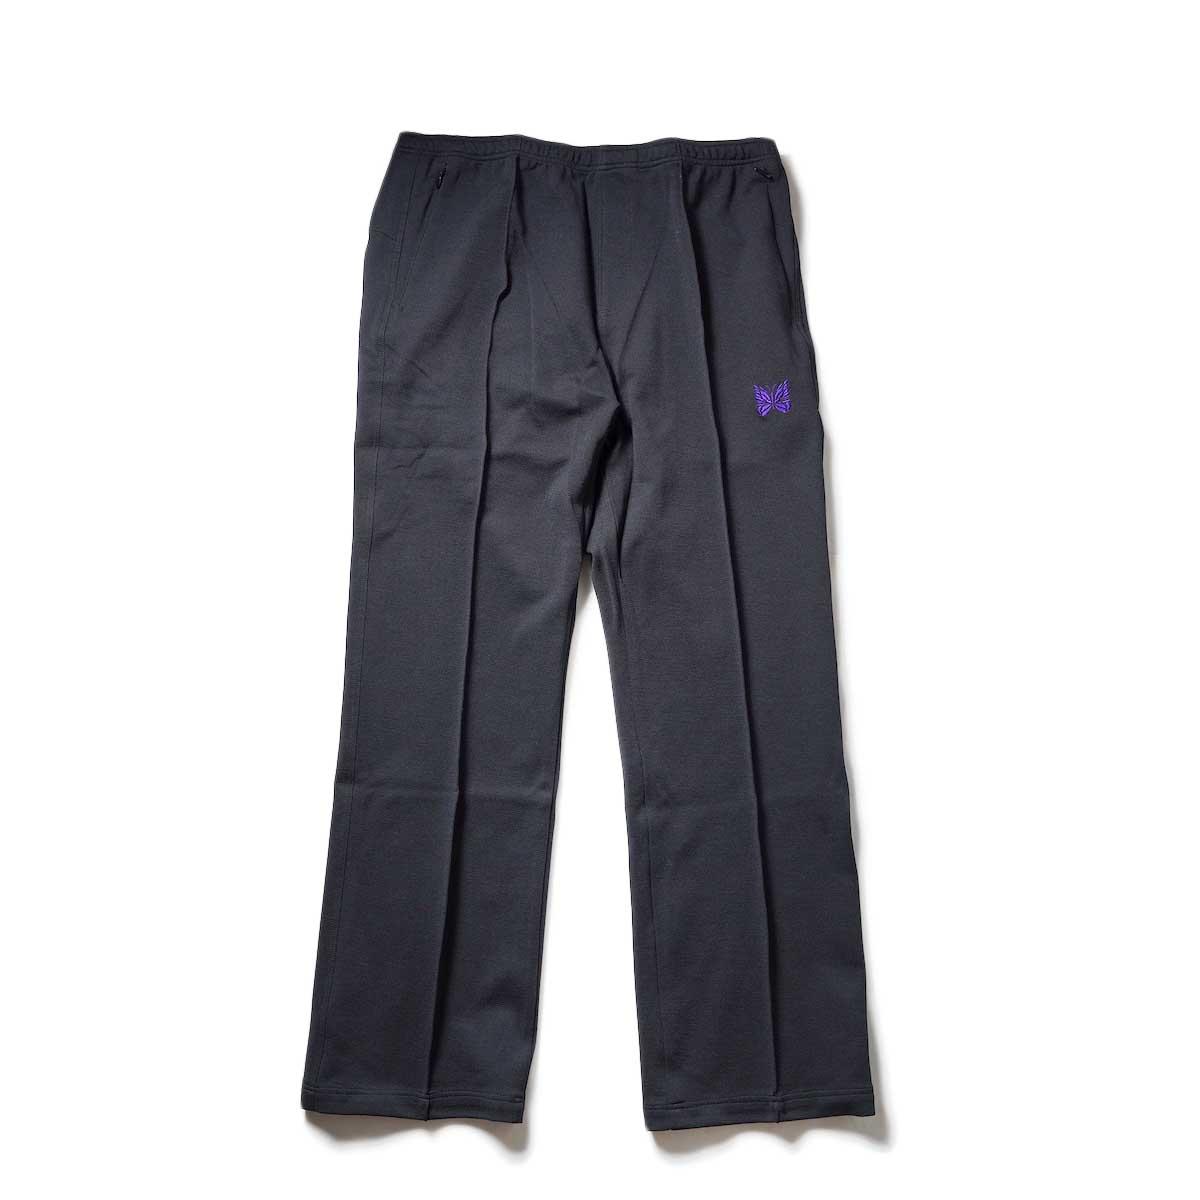 Needles / W.U. Boot-Cut Pant - Poly Twill Jersey (Black)